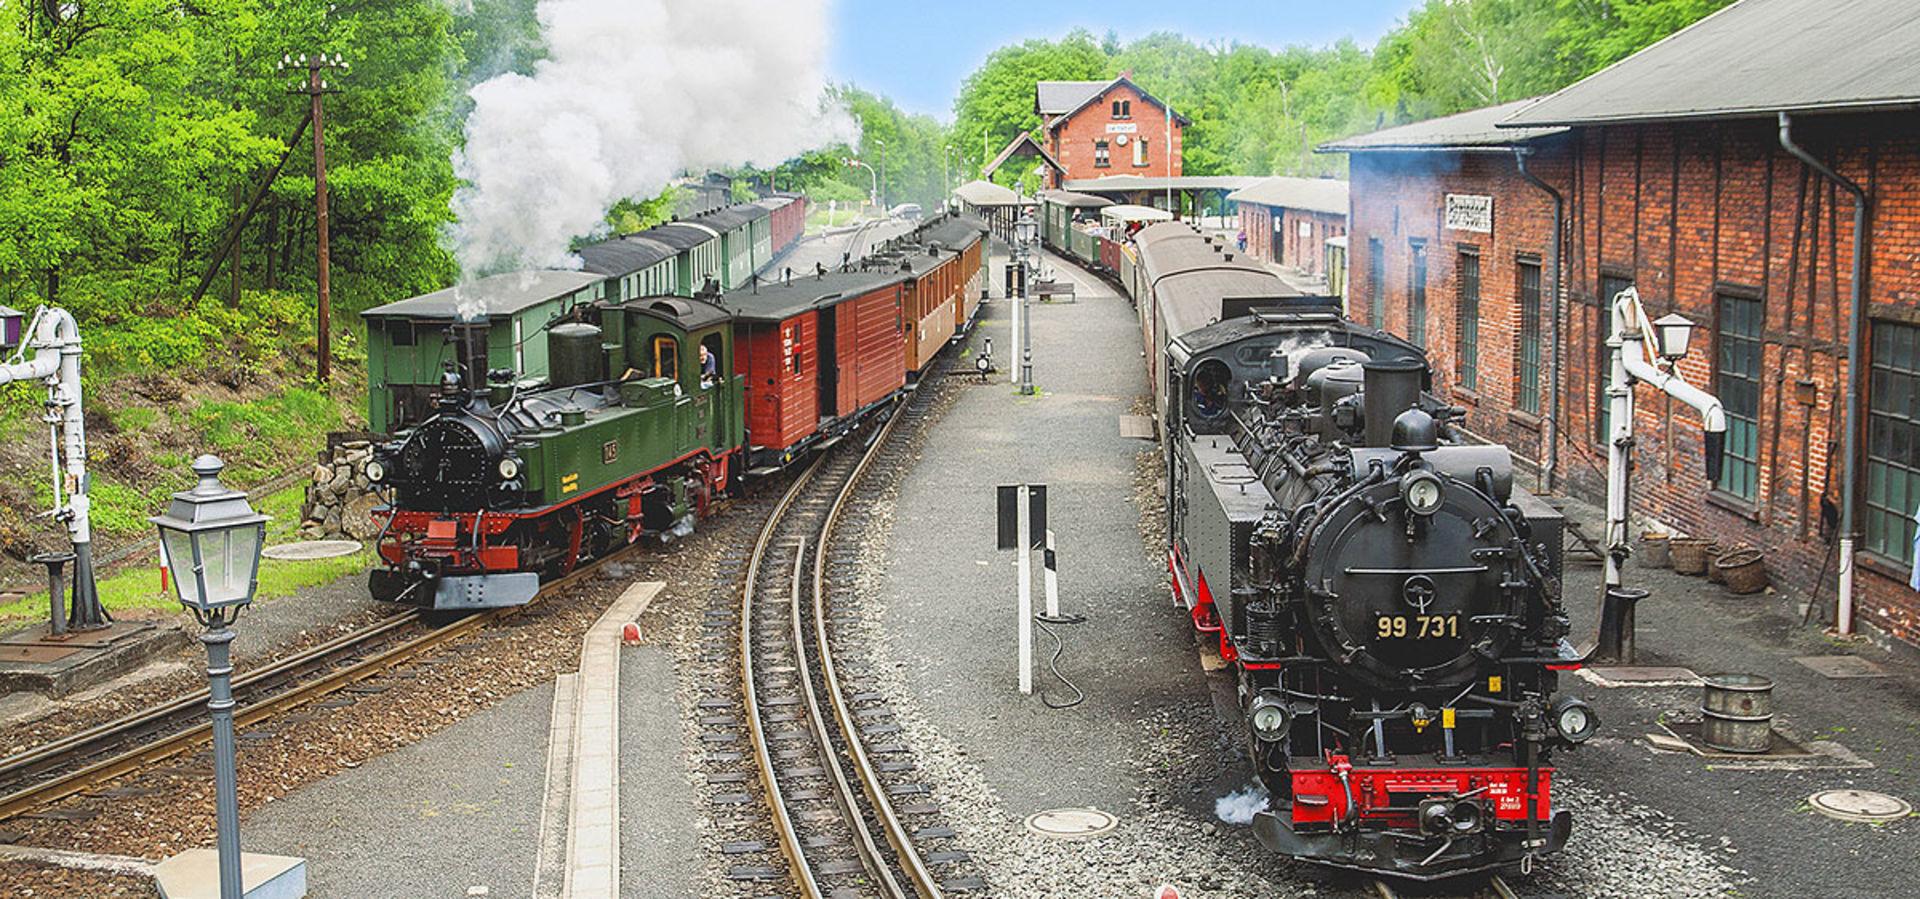 Doppelausfahrt in Bertsdorf.  © Mario England